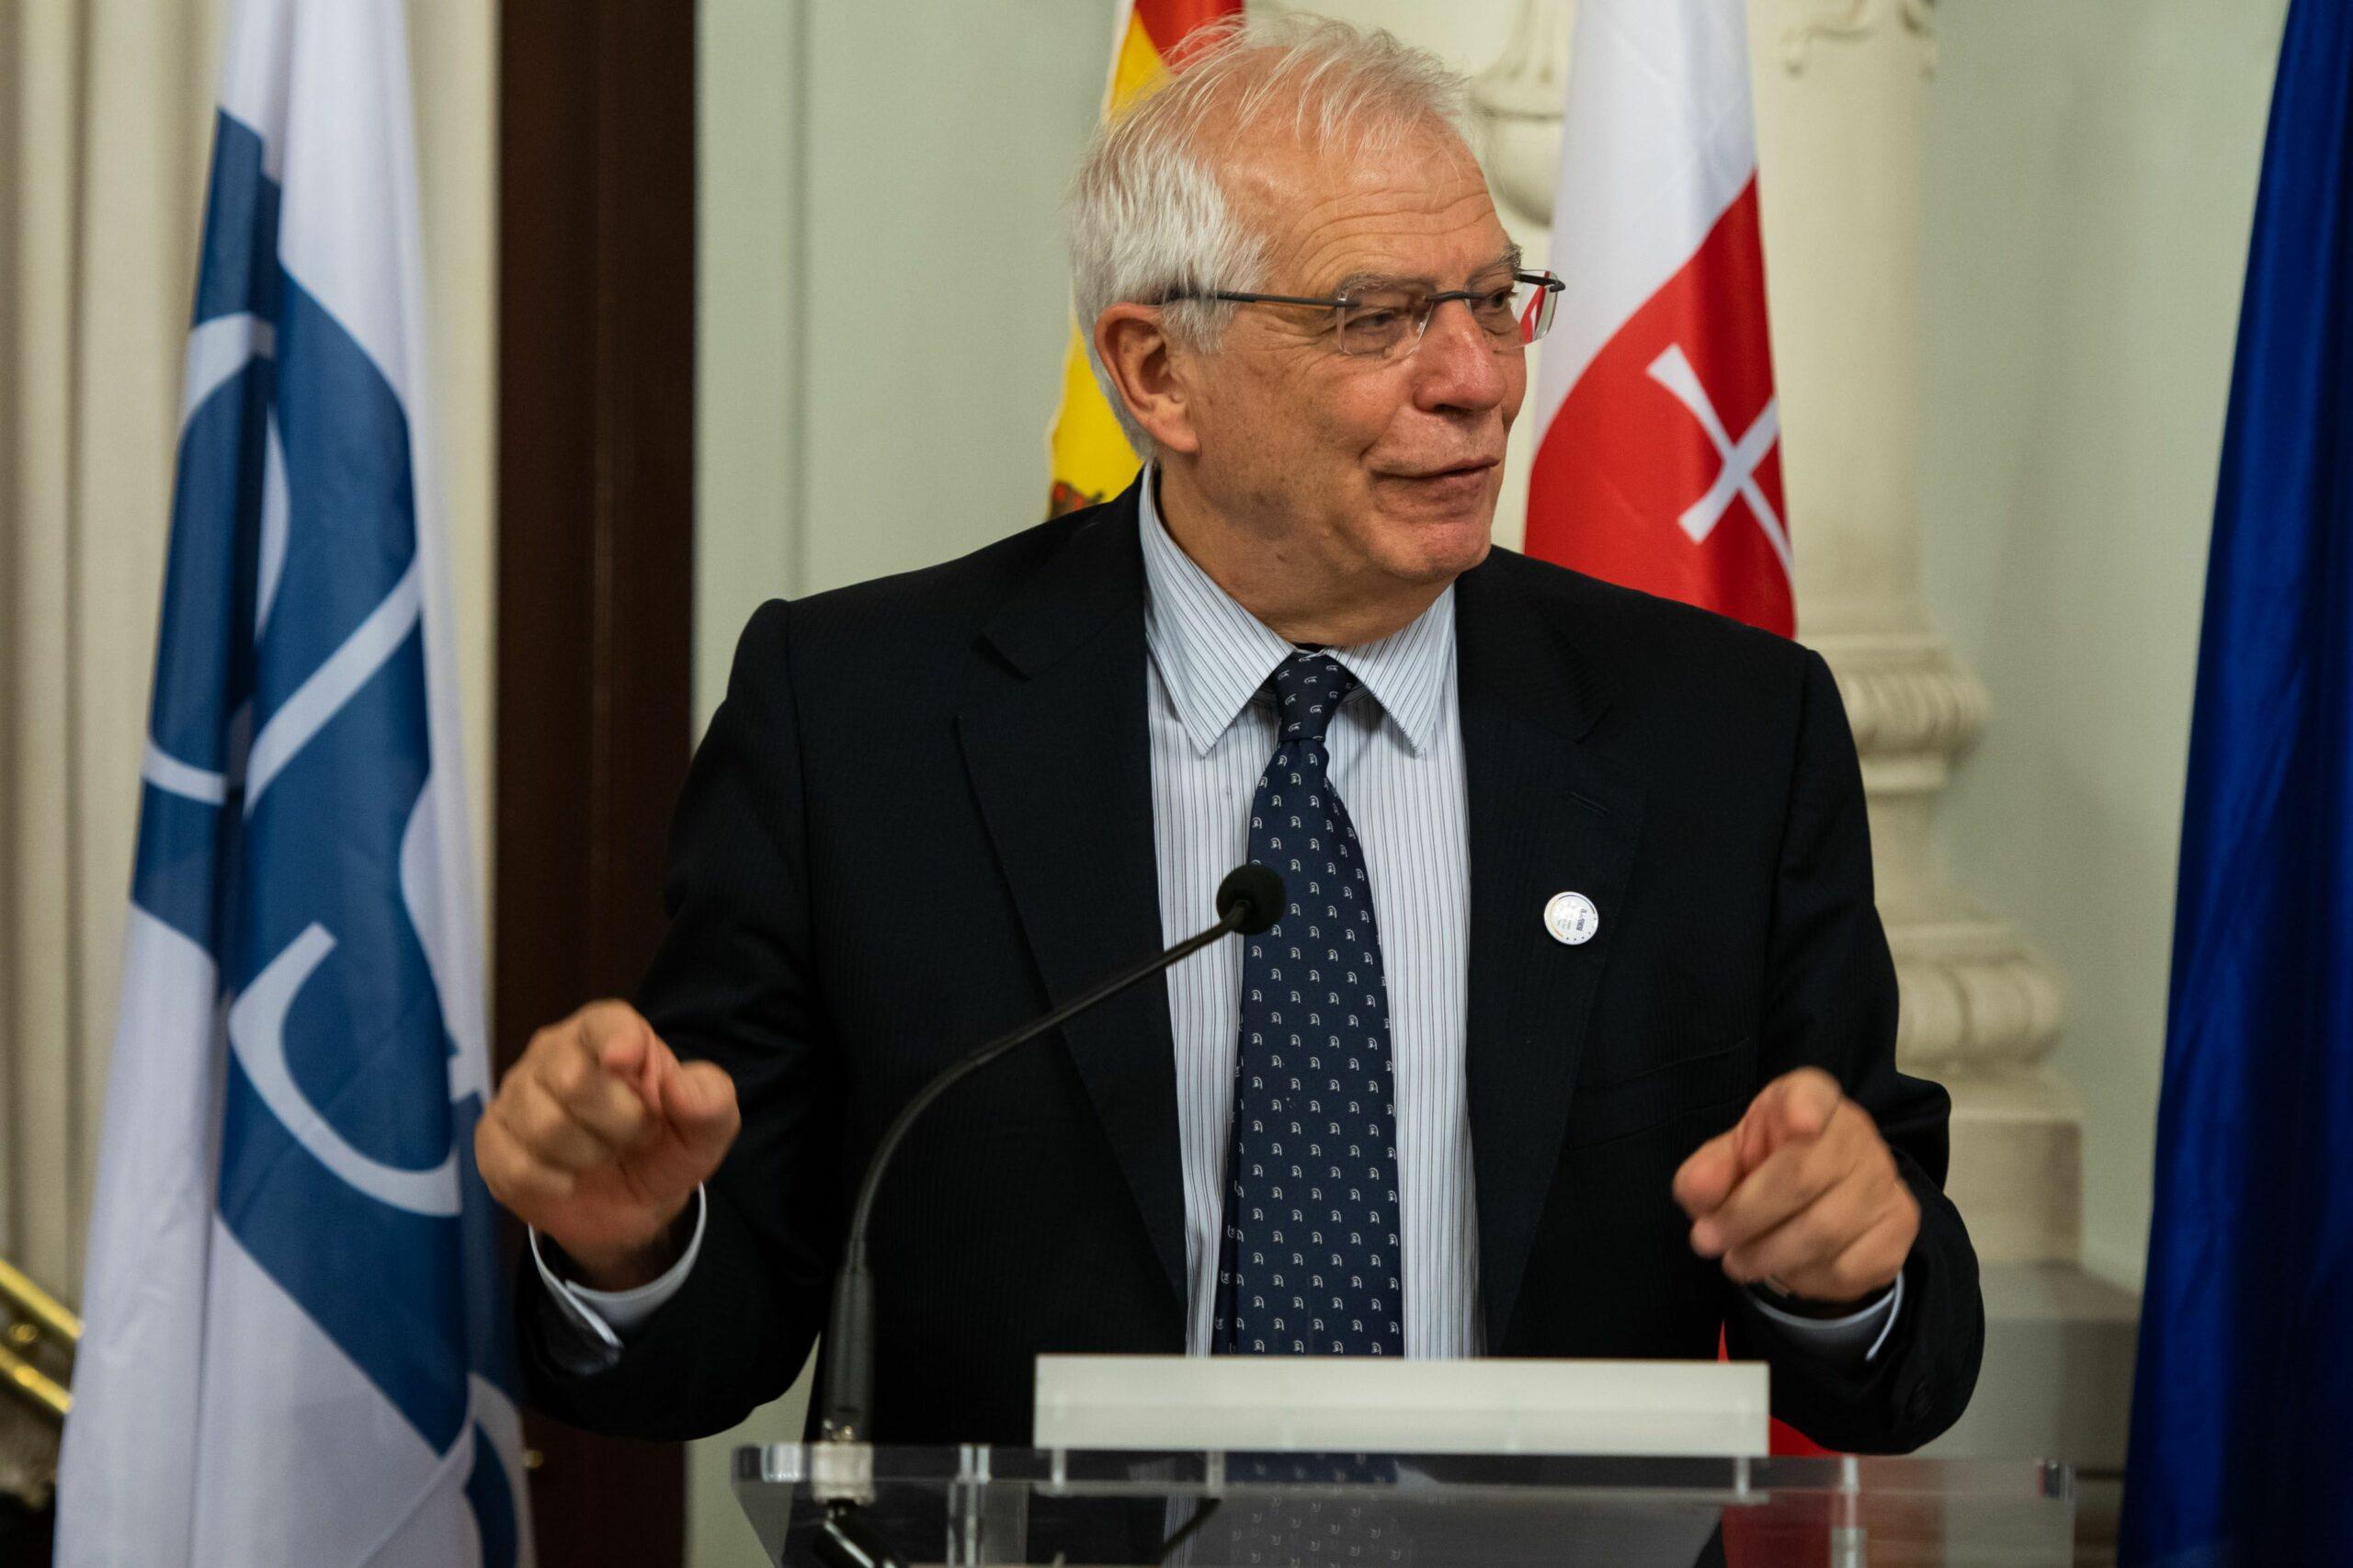 L'exministre d'Afers Exteriors espanyol, Josep Borrell   ACN